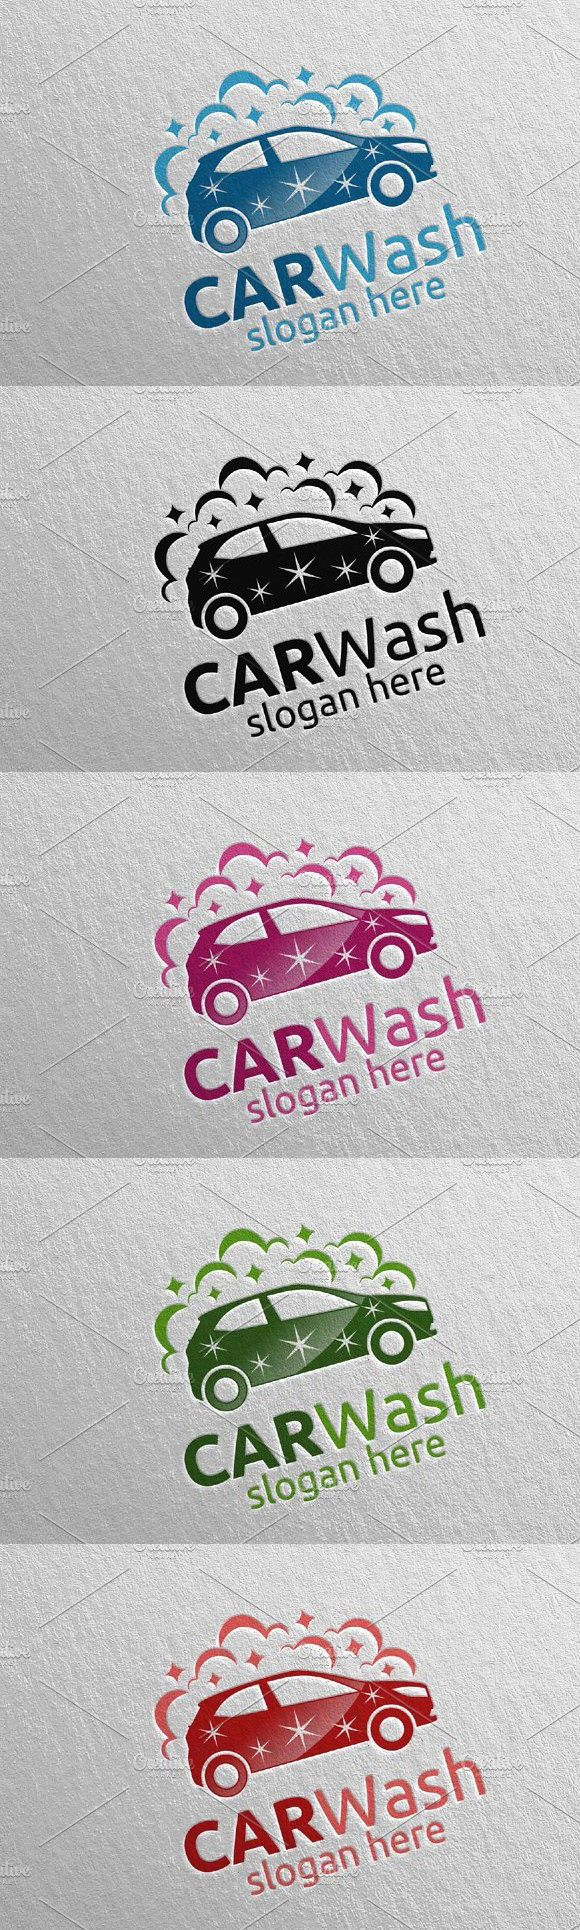 Car Wash Logo, Cleaning Car Logo 16 Wash logo, Car wash